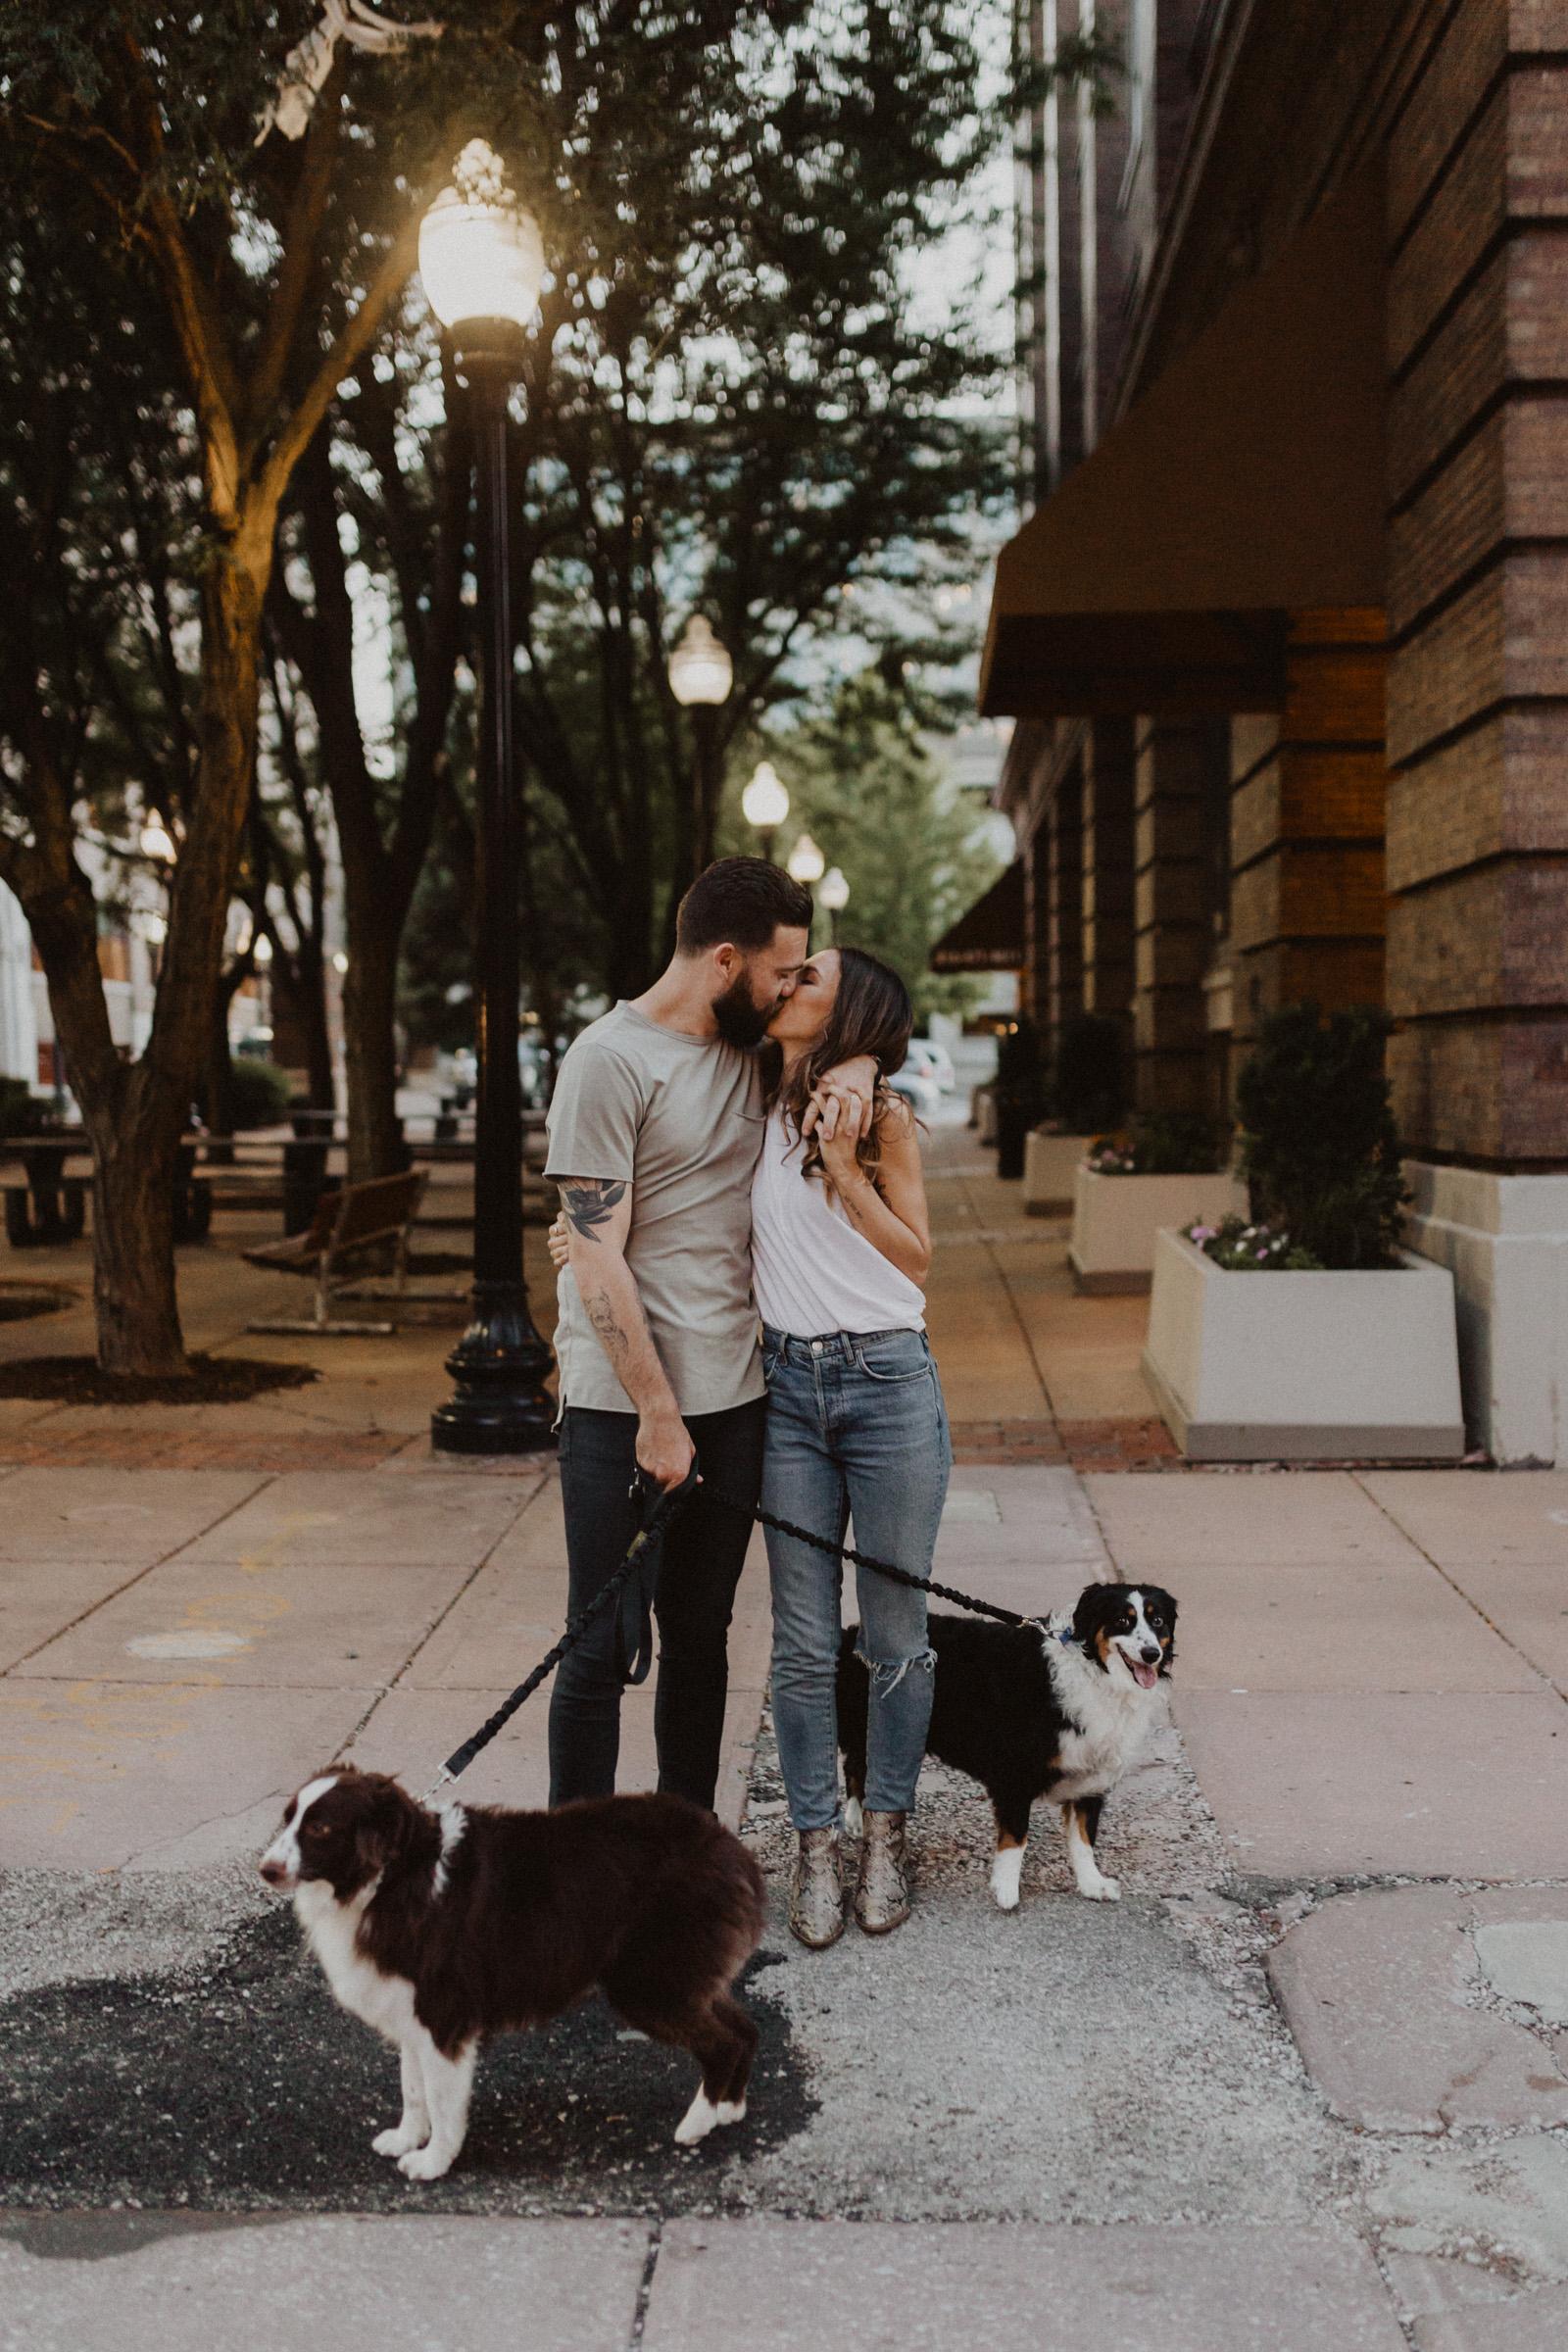 alyssa barletter photography downtown kansas city photos with couple and aussies austrailian shepards-6.jpg